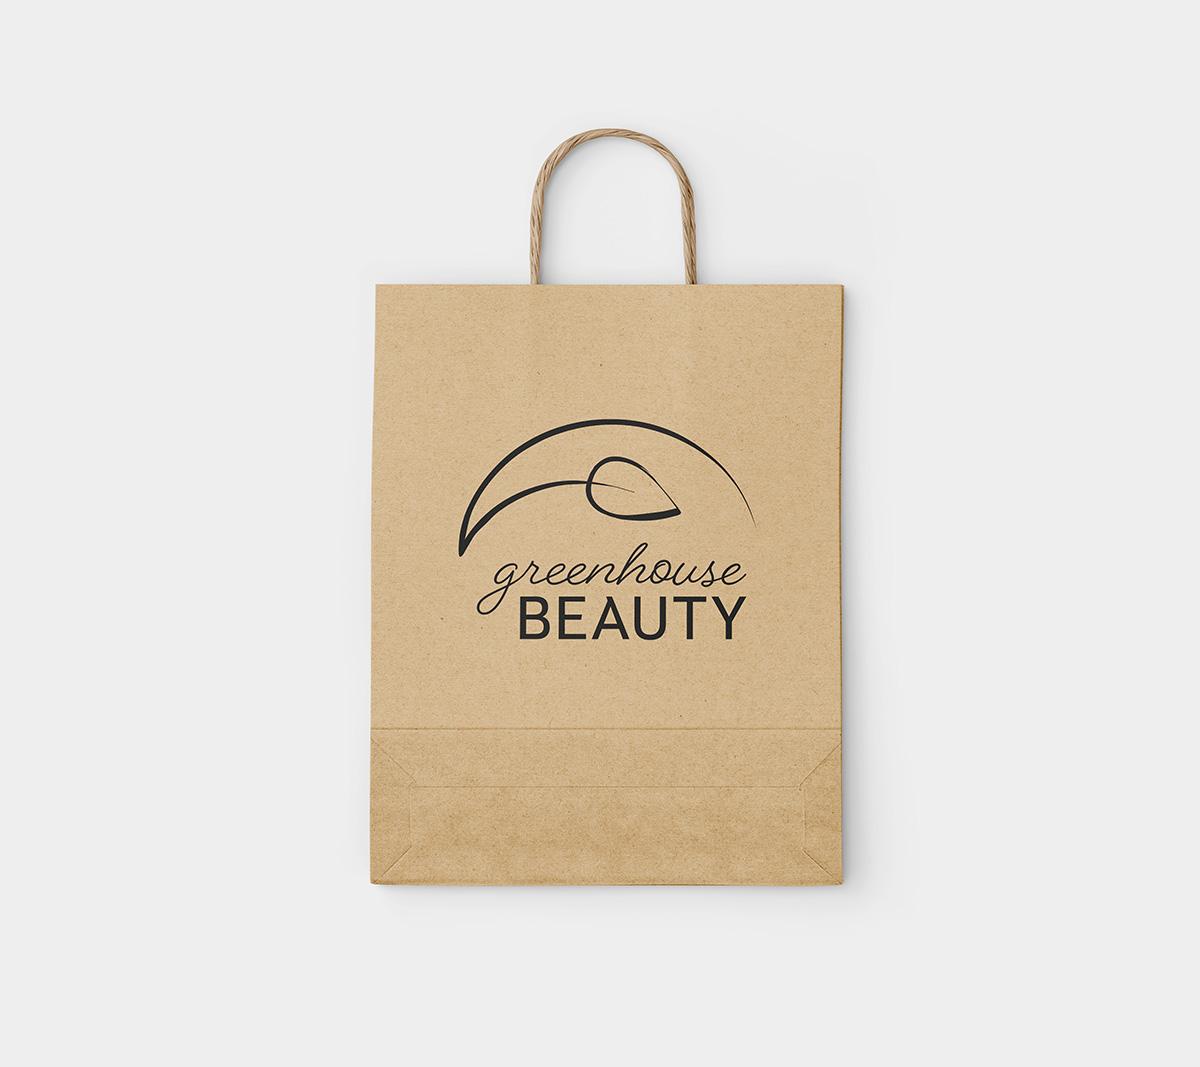 Greenhouse Beauty Logo on a shopping bag